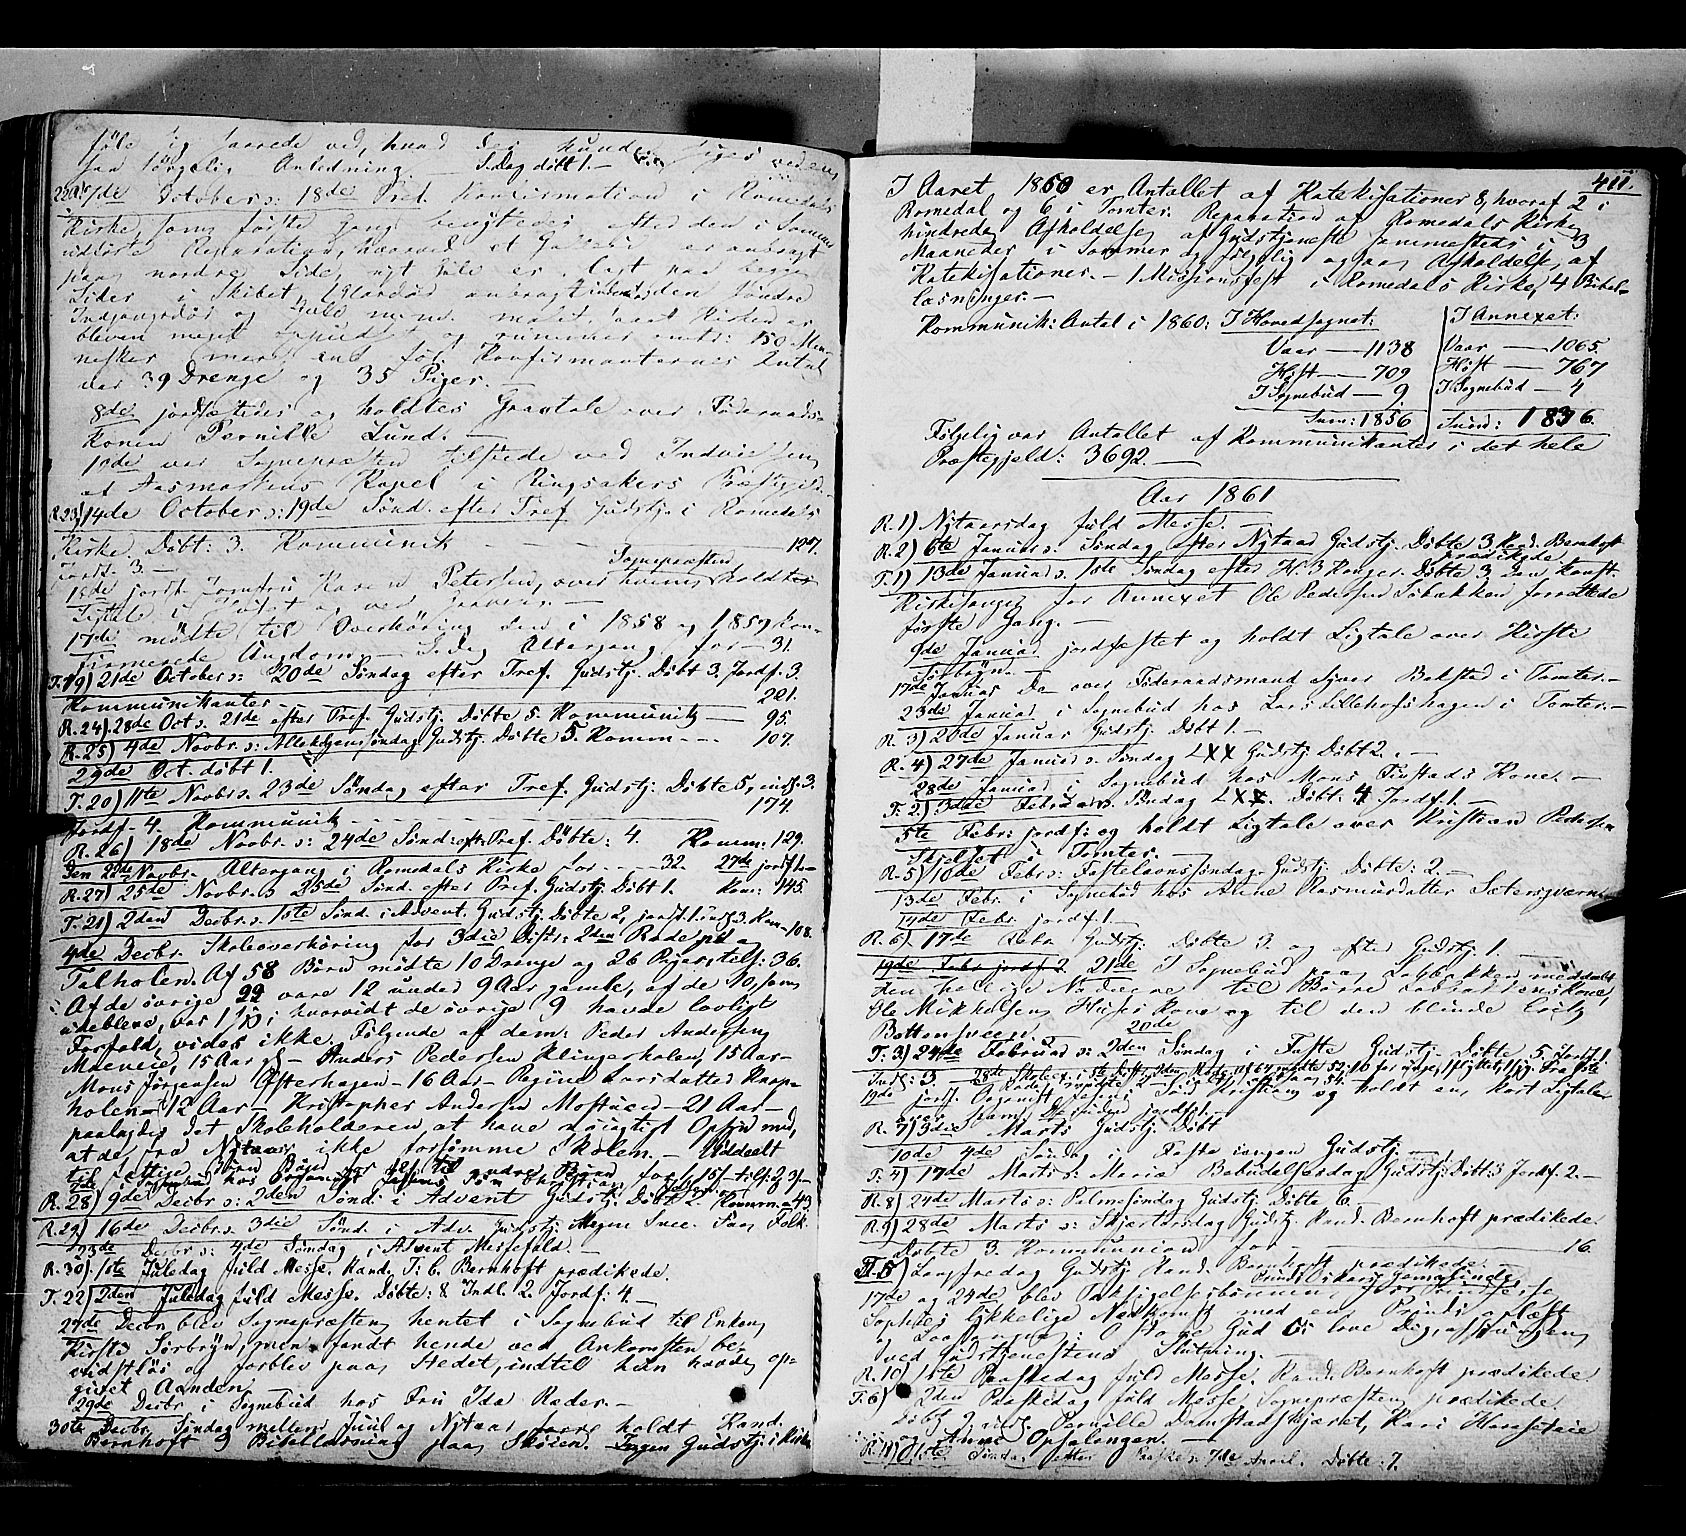 SAH, Romedal prestekontor, K/L0004: Ministerialbok nr. 4, 1847-1861, s. 411